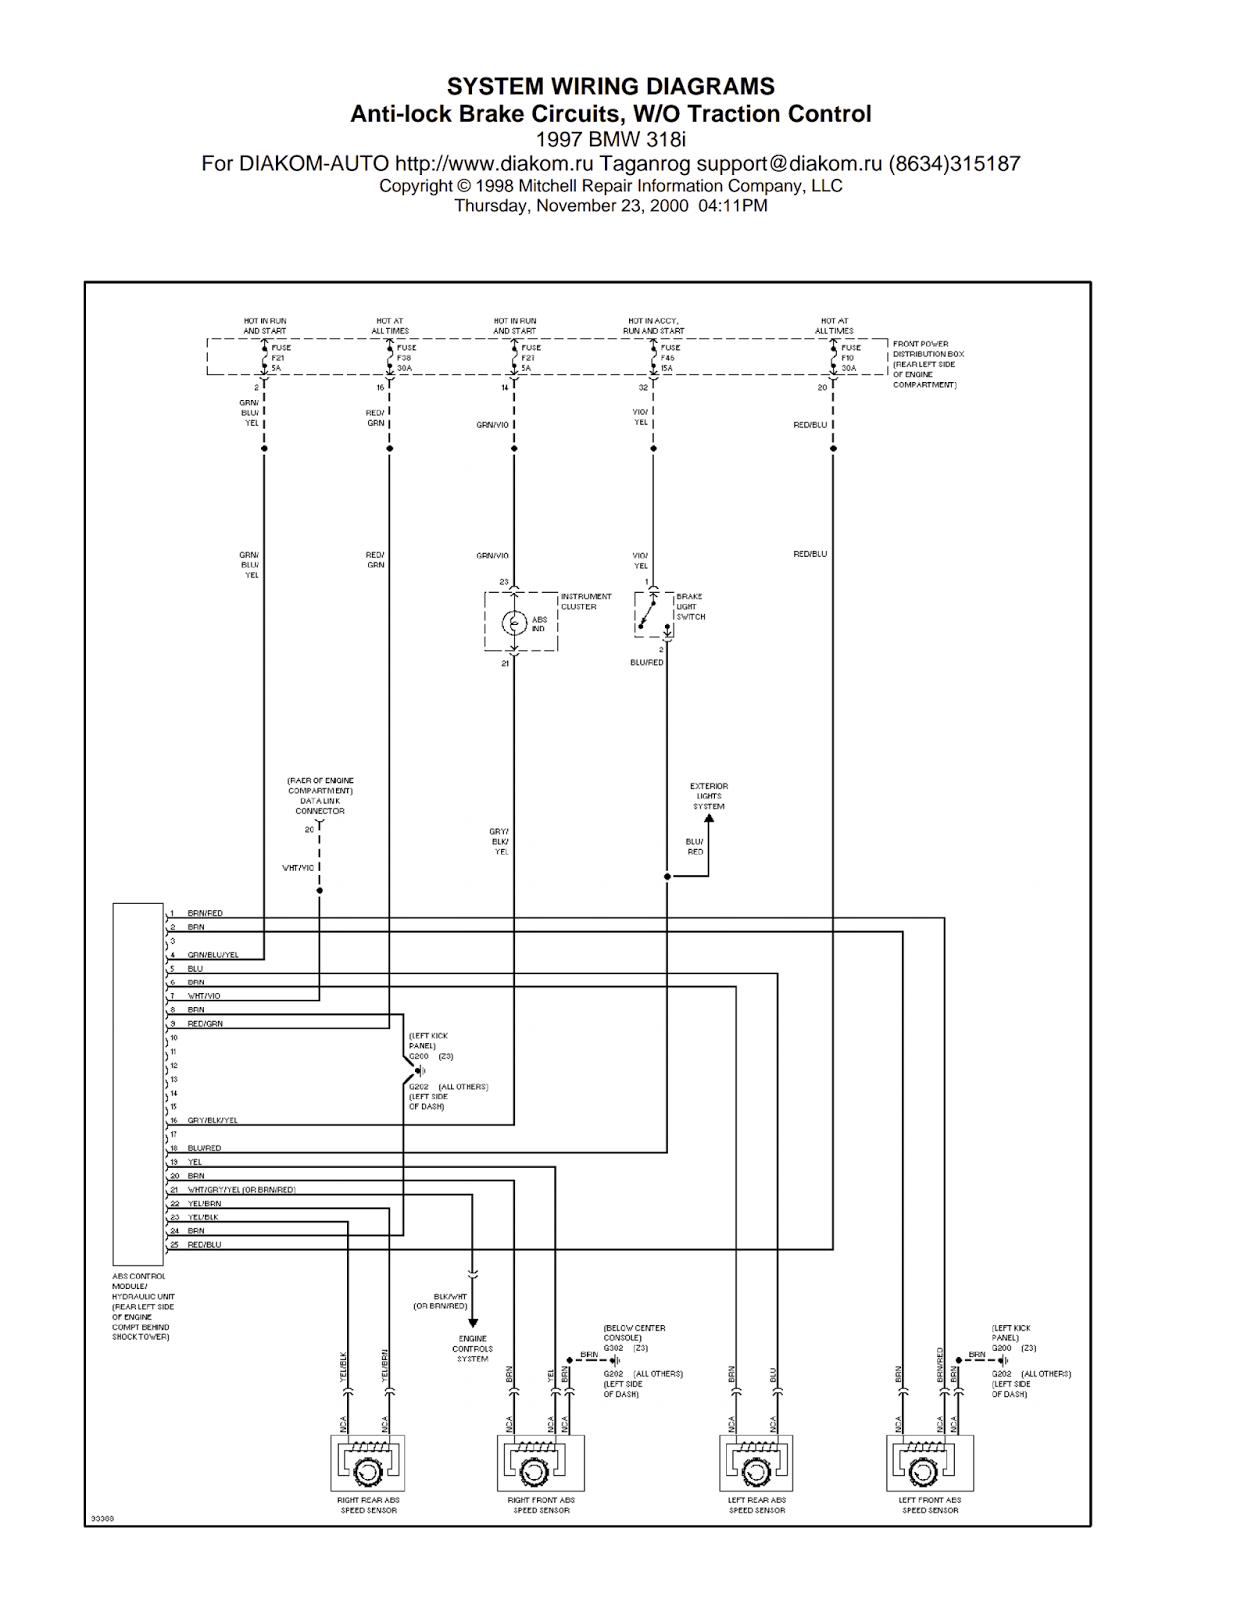 Wiring Diagrams and Free Manual Ebooks: 1997 BMW 318i Anti